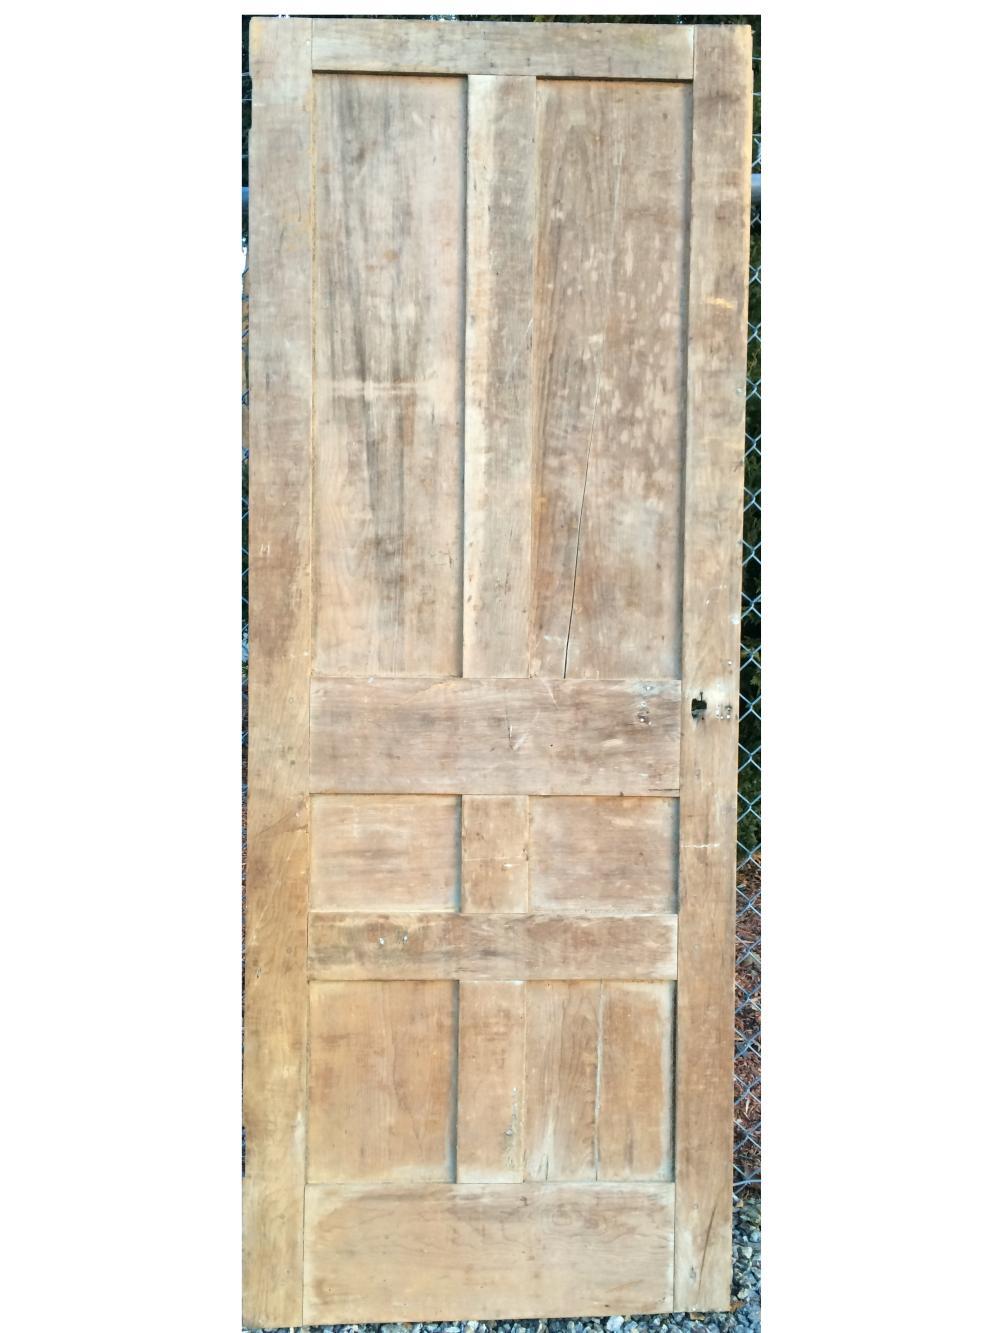 EARLY 18TH C PANELED  DOOR